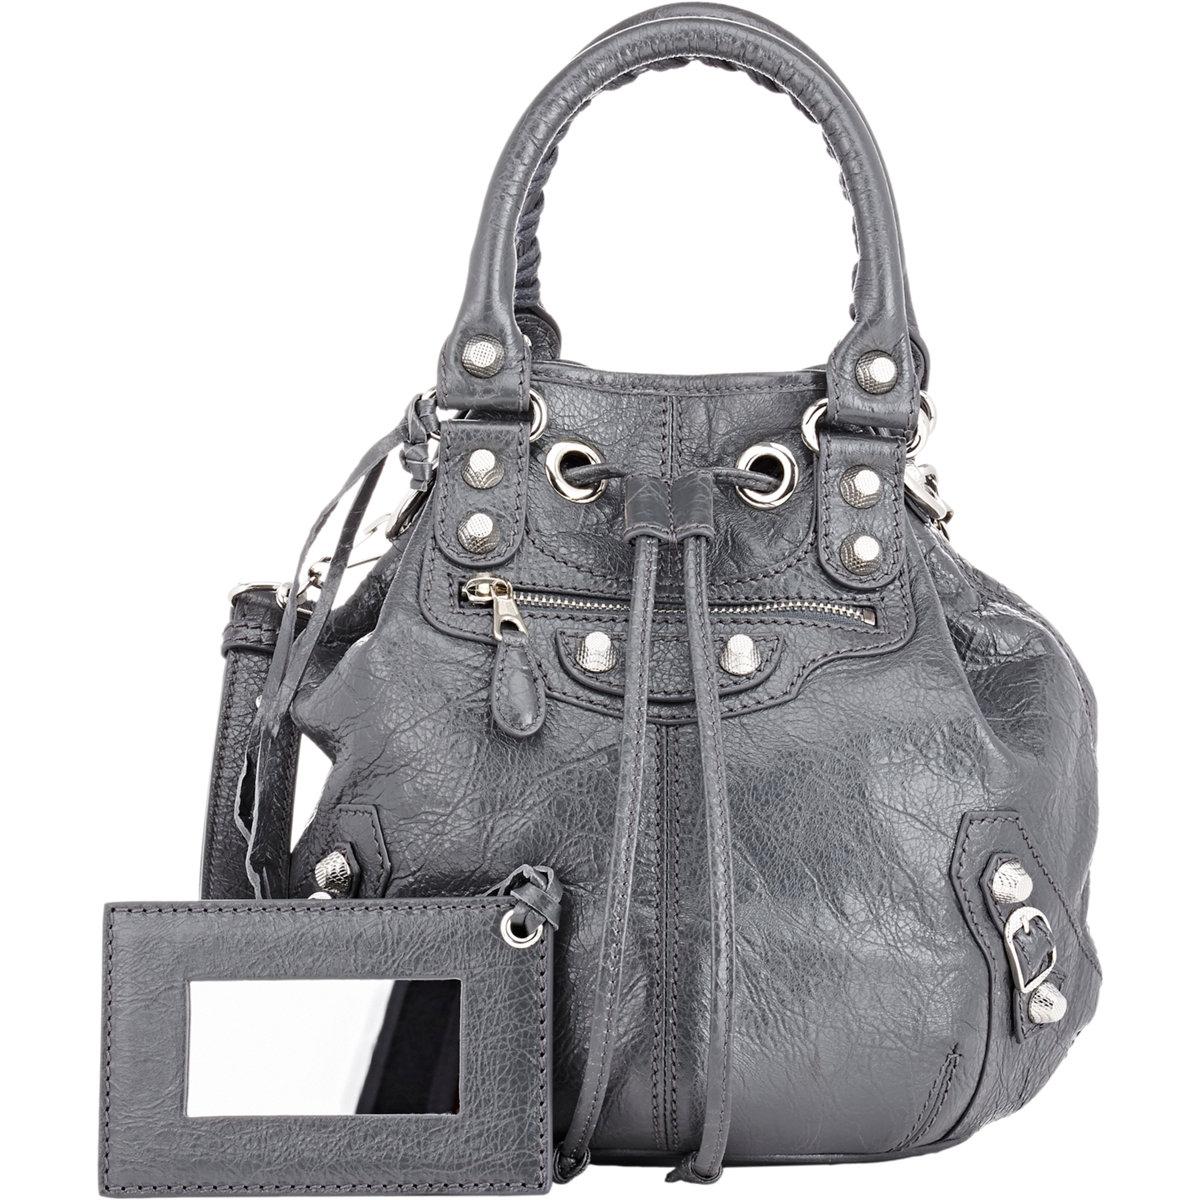 8f117d74b3a1 ... Balenciaga Arena Giant 12 Mini Pompon Bucket Bag in Gray (Grey) Lyst  hot sale ...